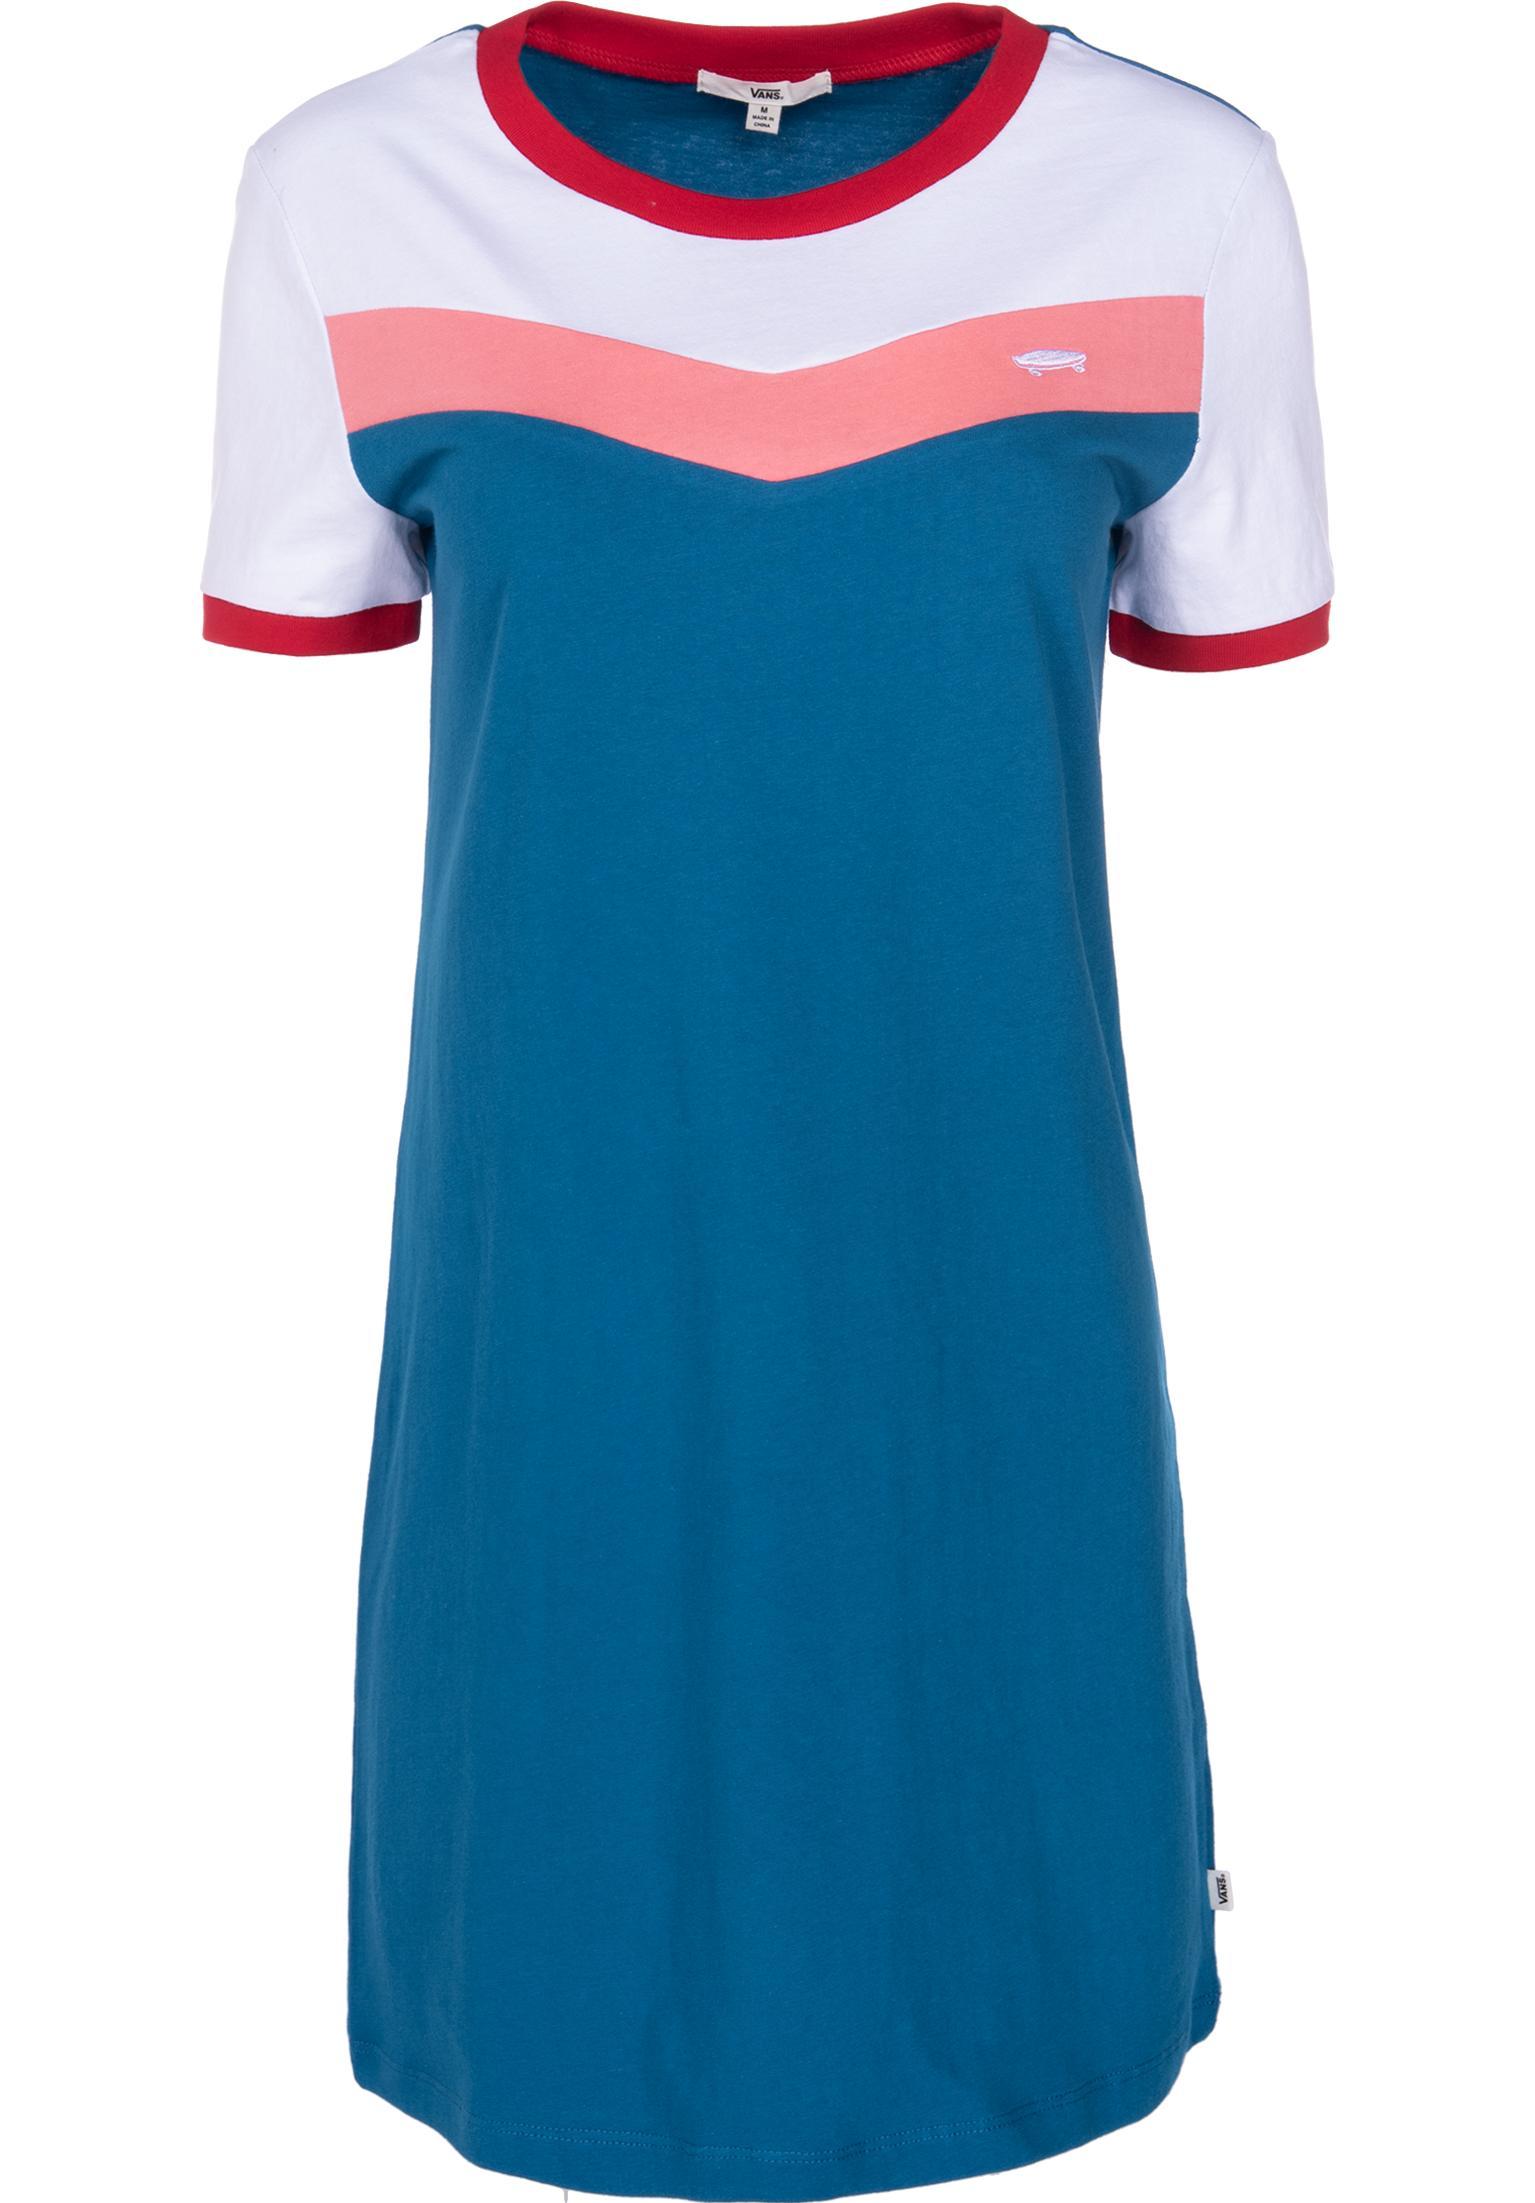 cee84b88d63 Invert Vans Dresses in bluesapphire for Women